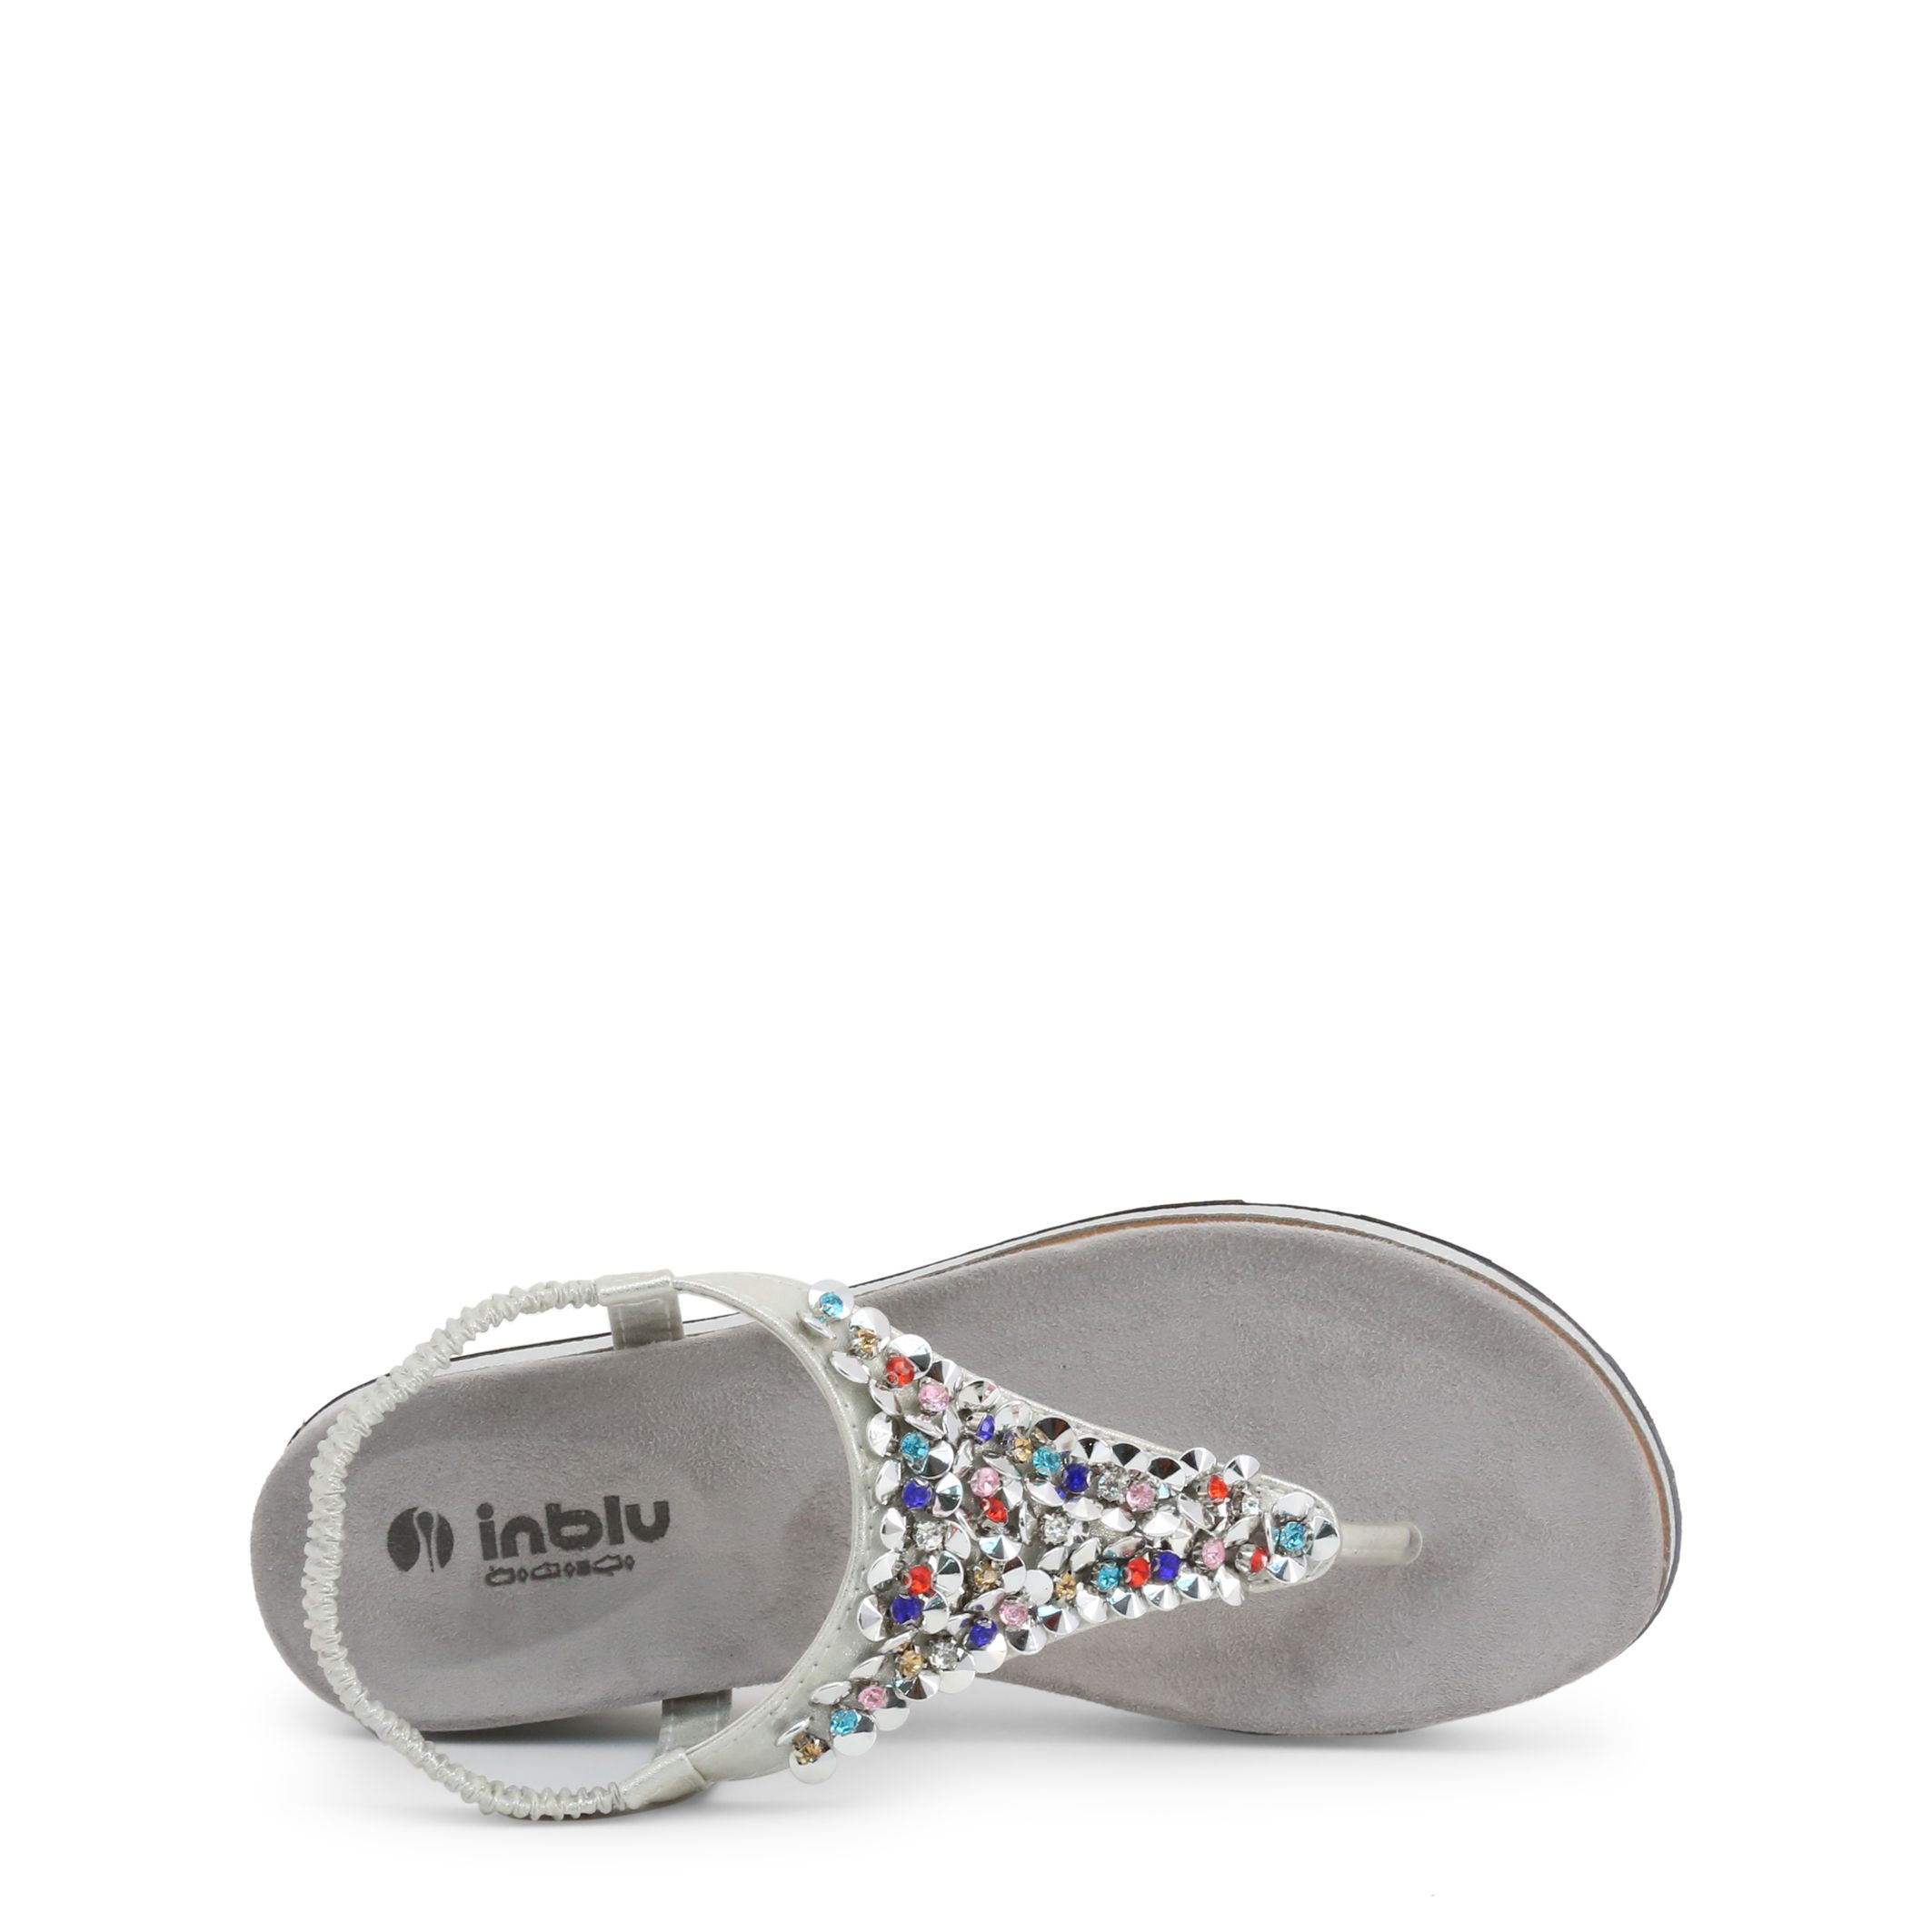 Inblu - SA000027  | You Fashion Outlet